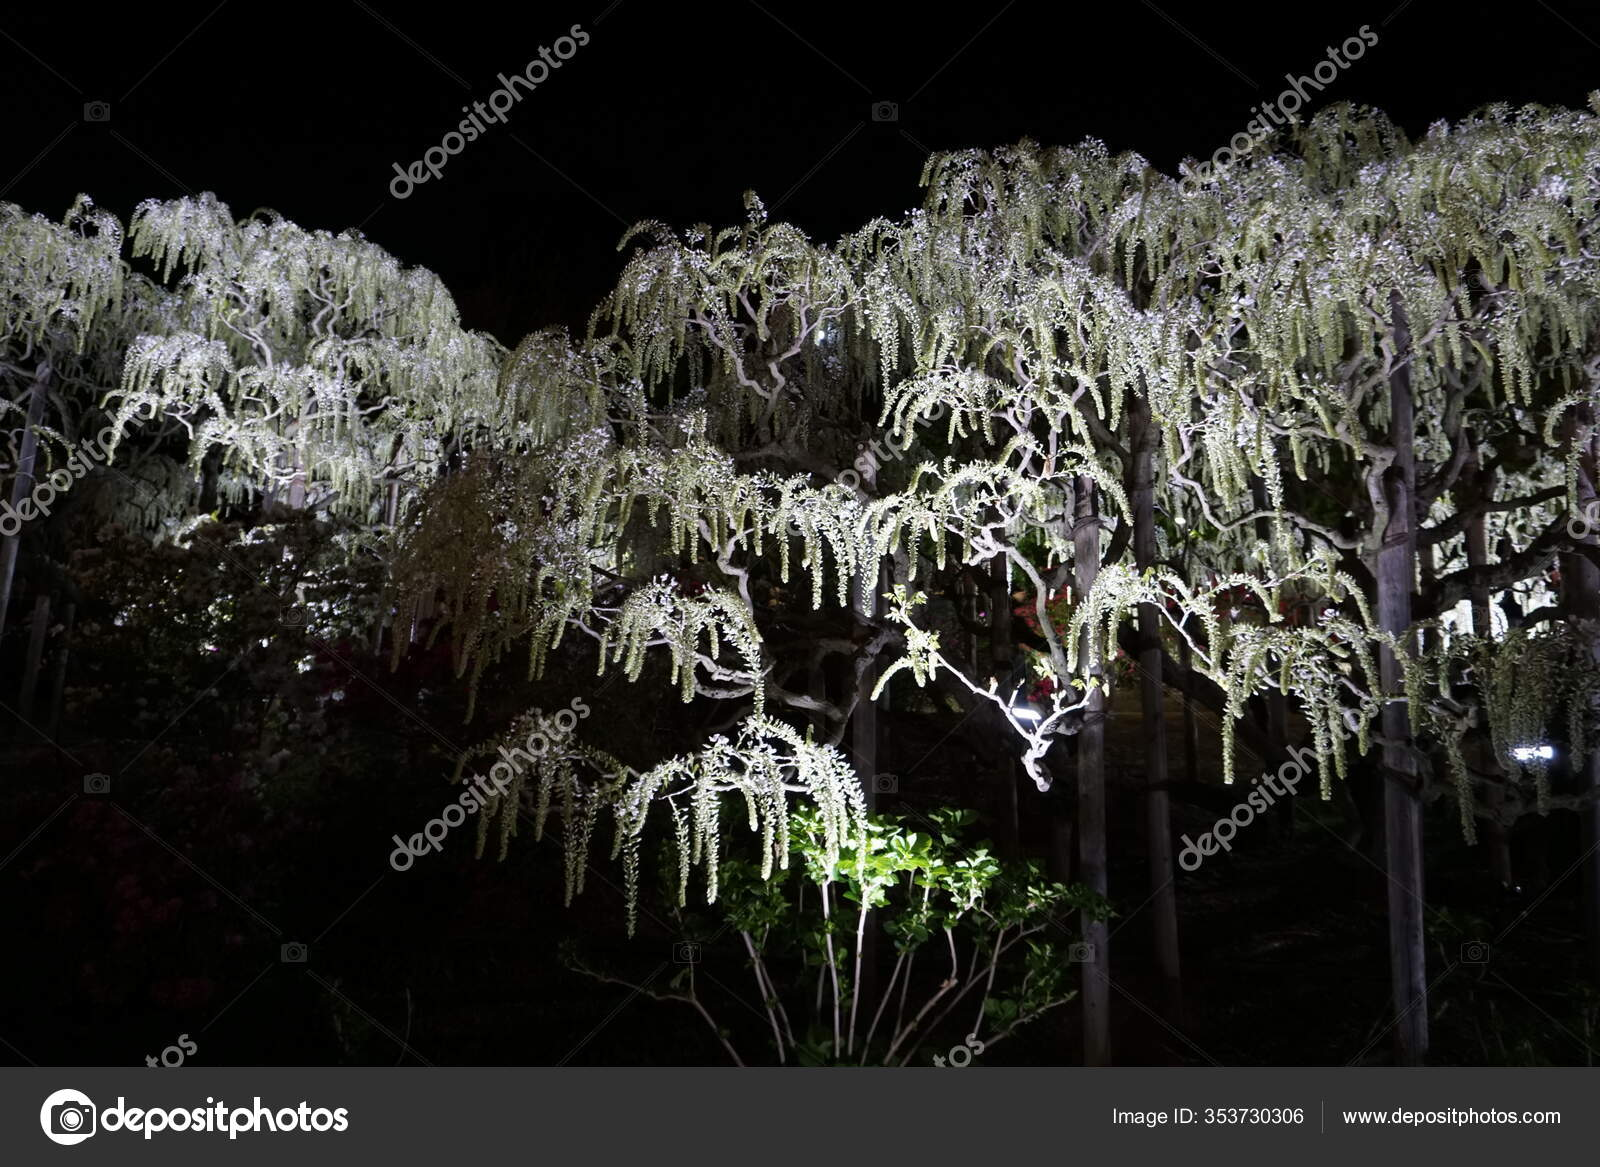 Pendurado Cachos Branco Wisteria Arvore Iluminacao Noite Hora Primavera Japao Stock Photo C Tanya Tawa Hotmail Com 353730306